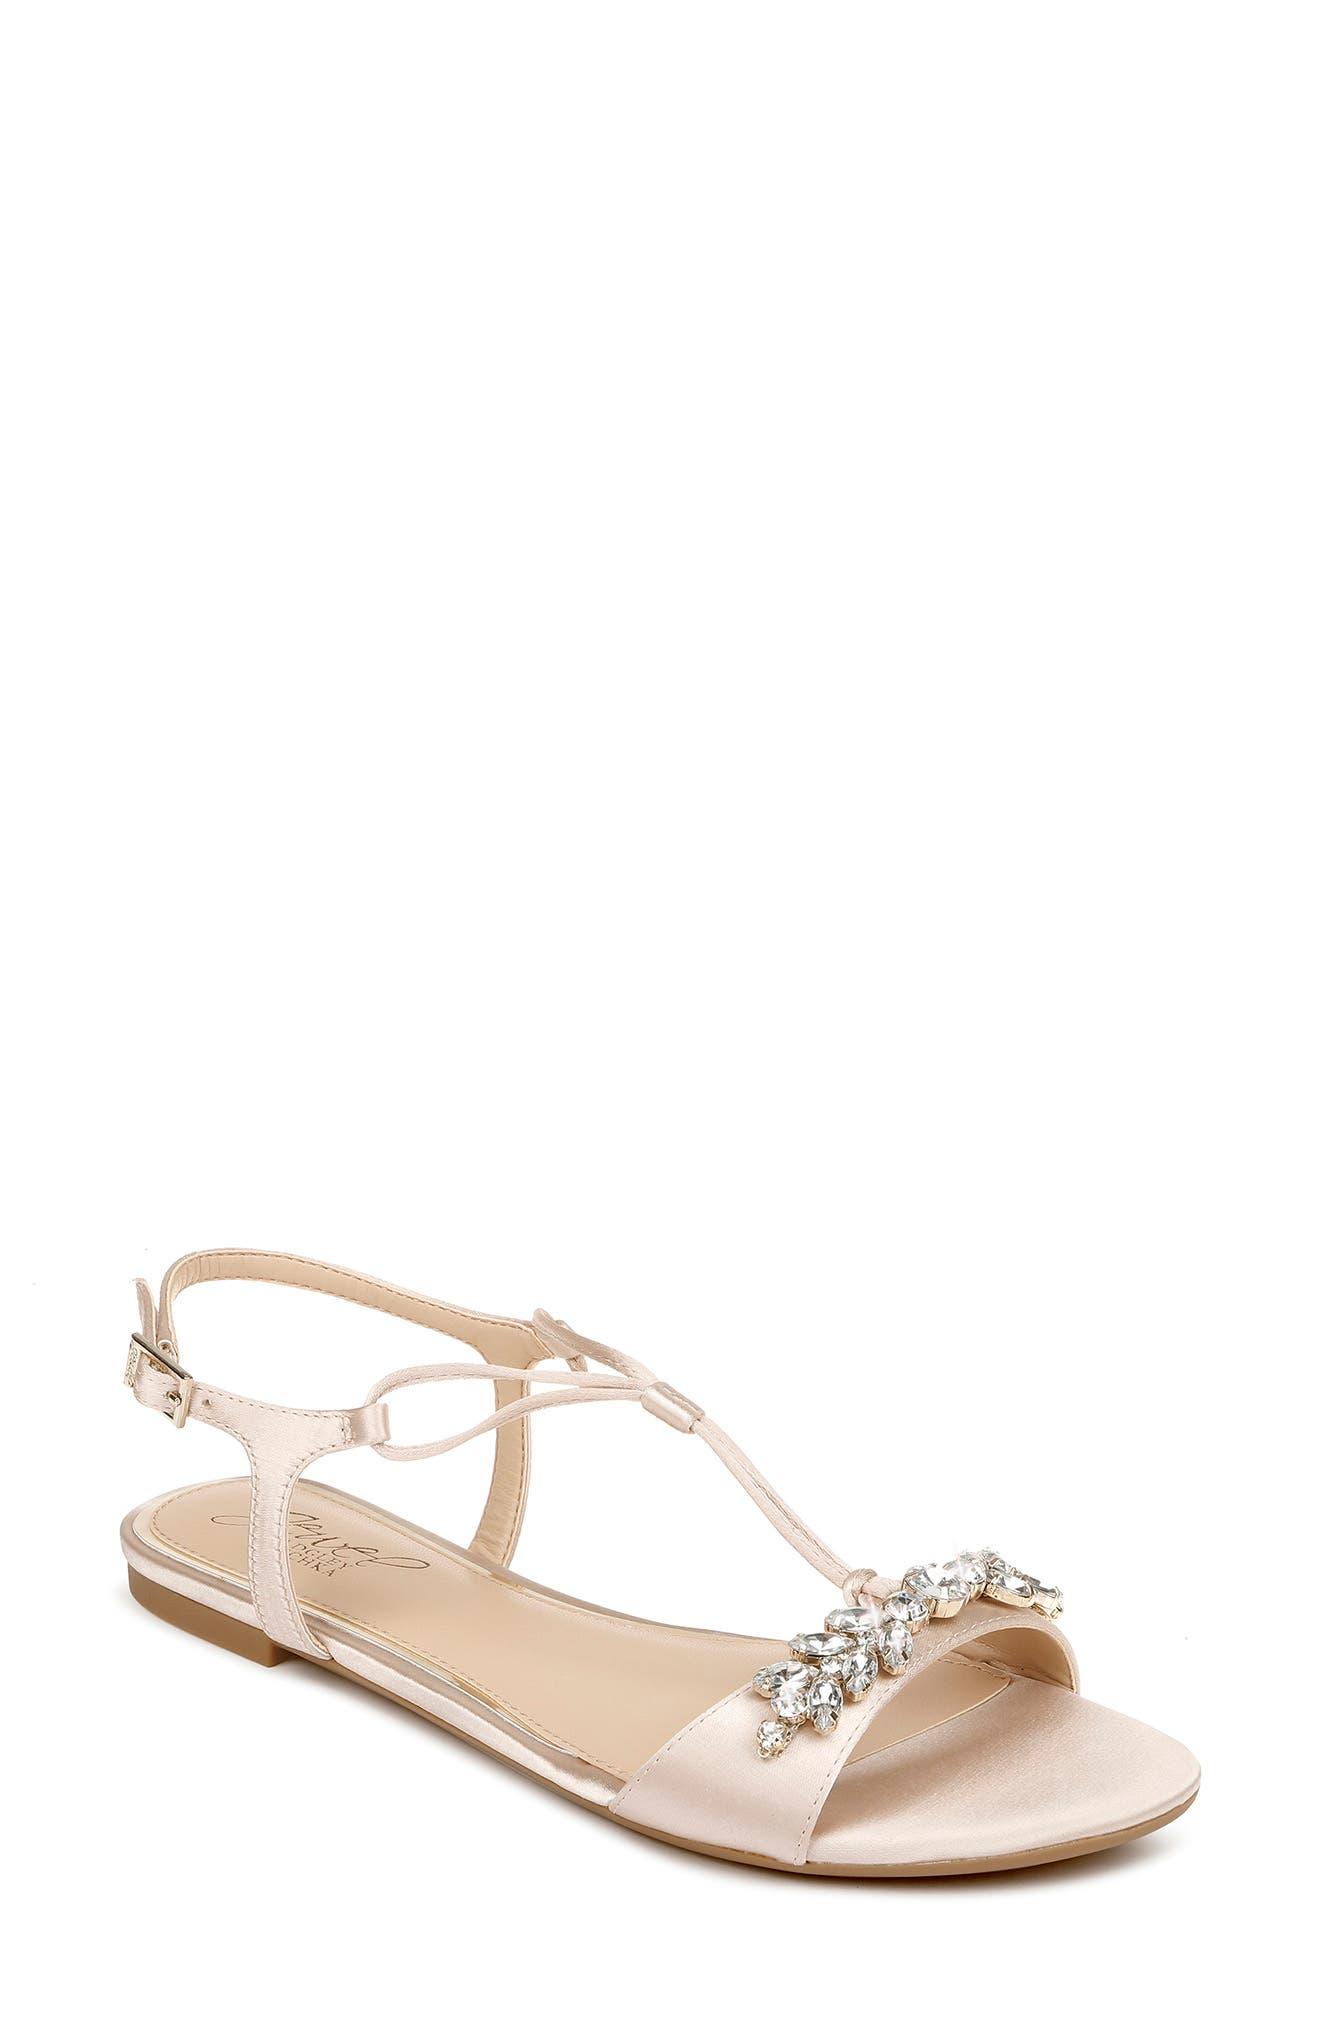 Women's Badgely Mischka Paulina Embellished Sandal